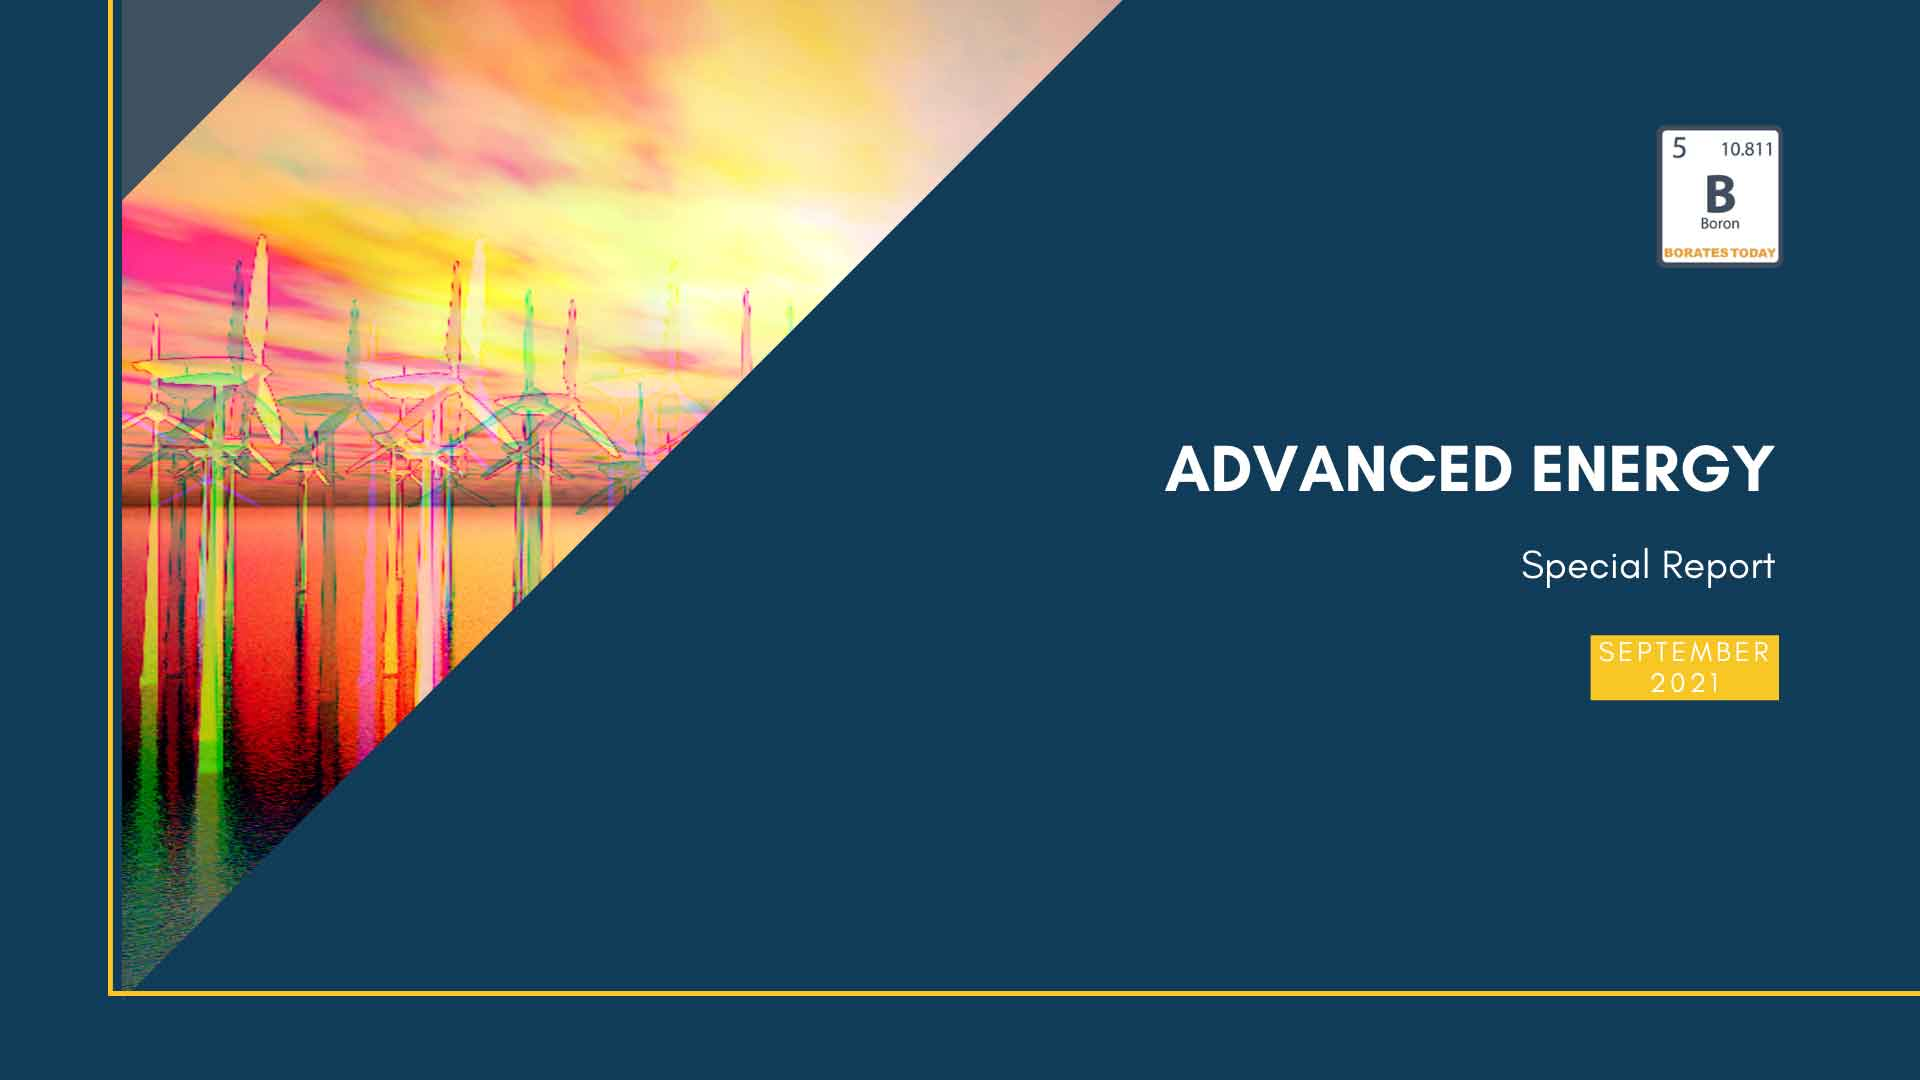 Boron Advanced Energy: Special Report